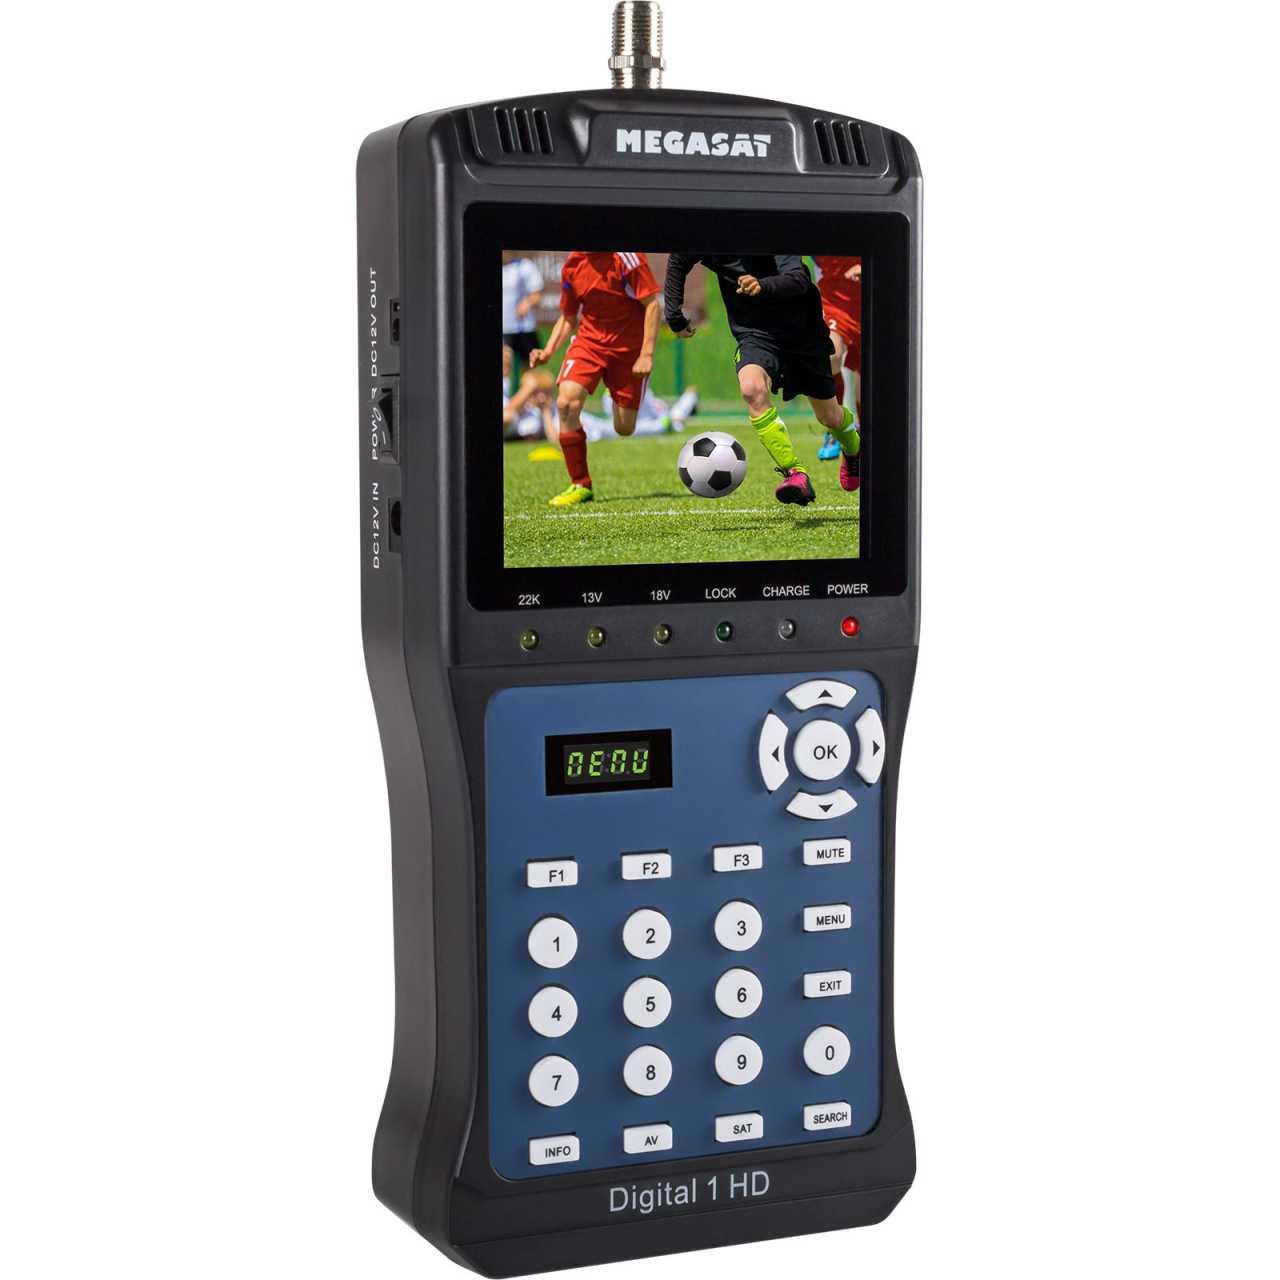 Megasat Satmessgerät Digital 1 HD TV LCD DVB-S2 Satelliten-Finder Vorprogrammiert MONMES055